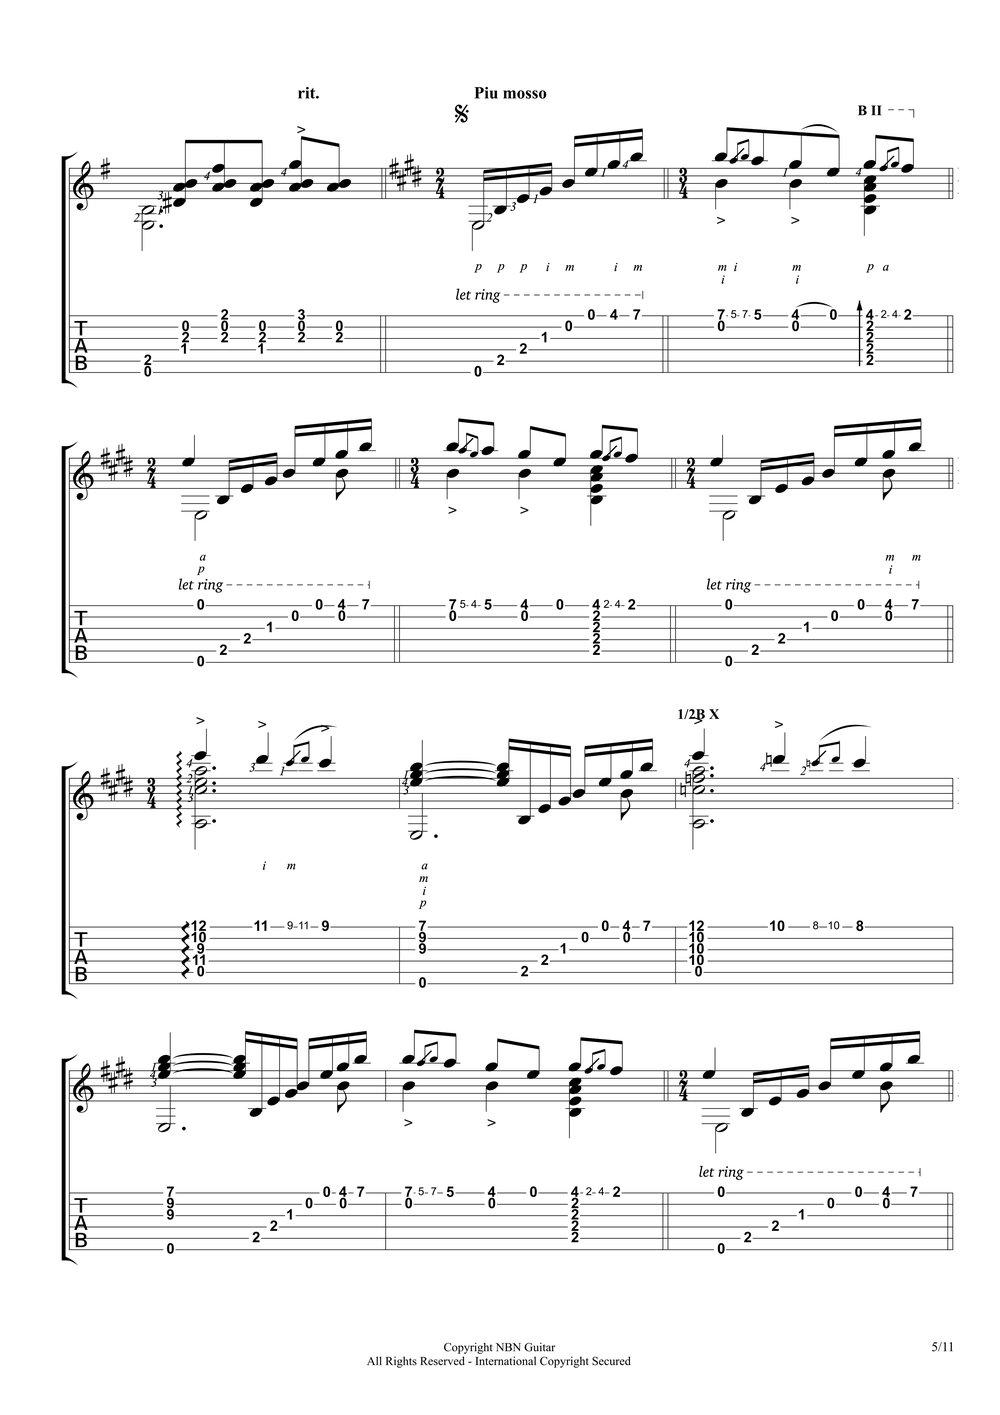 Prelude No. 1 in E-minor (Sheet Music & Tabs)-p07.jpg